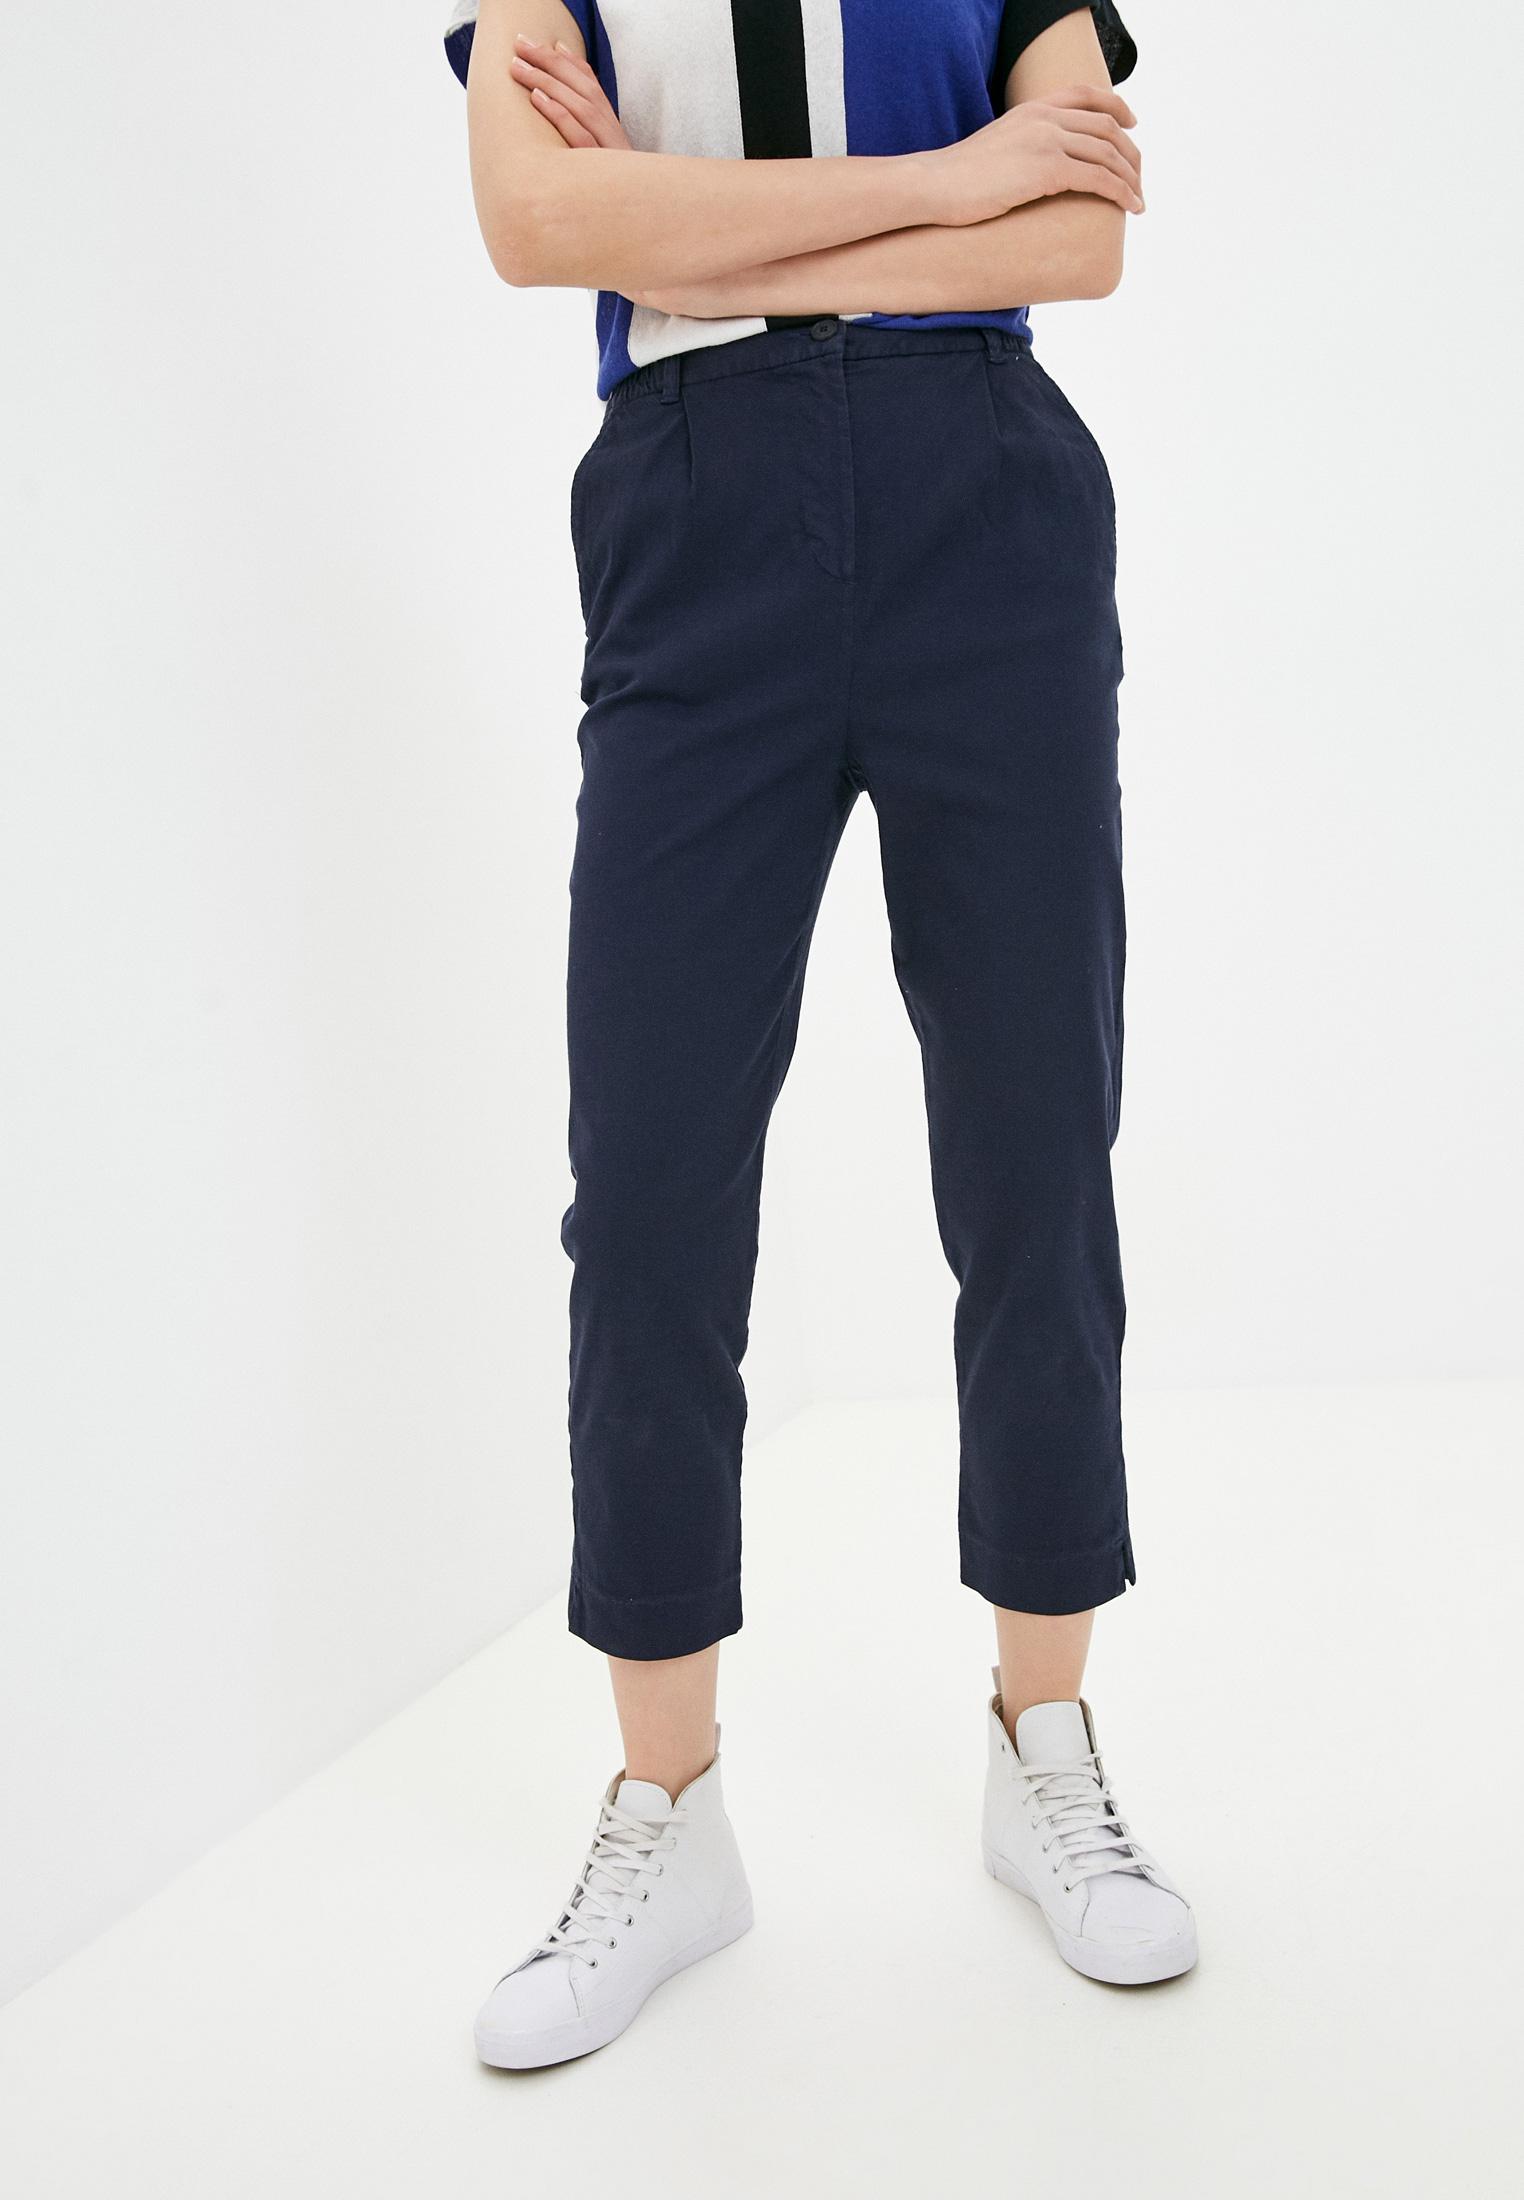 Женские зауженные брюки United Colors of Benetton (Юнайтед Колорс оф Бенеттон) Брюки United Colors of Benetton